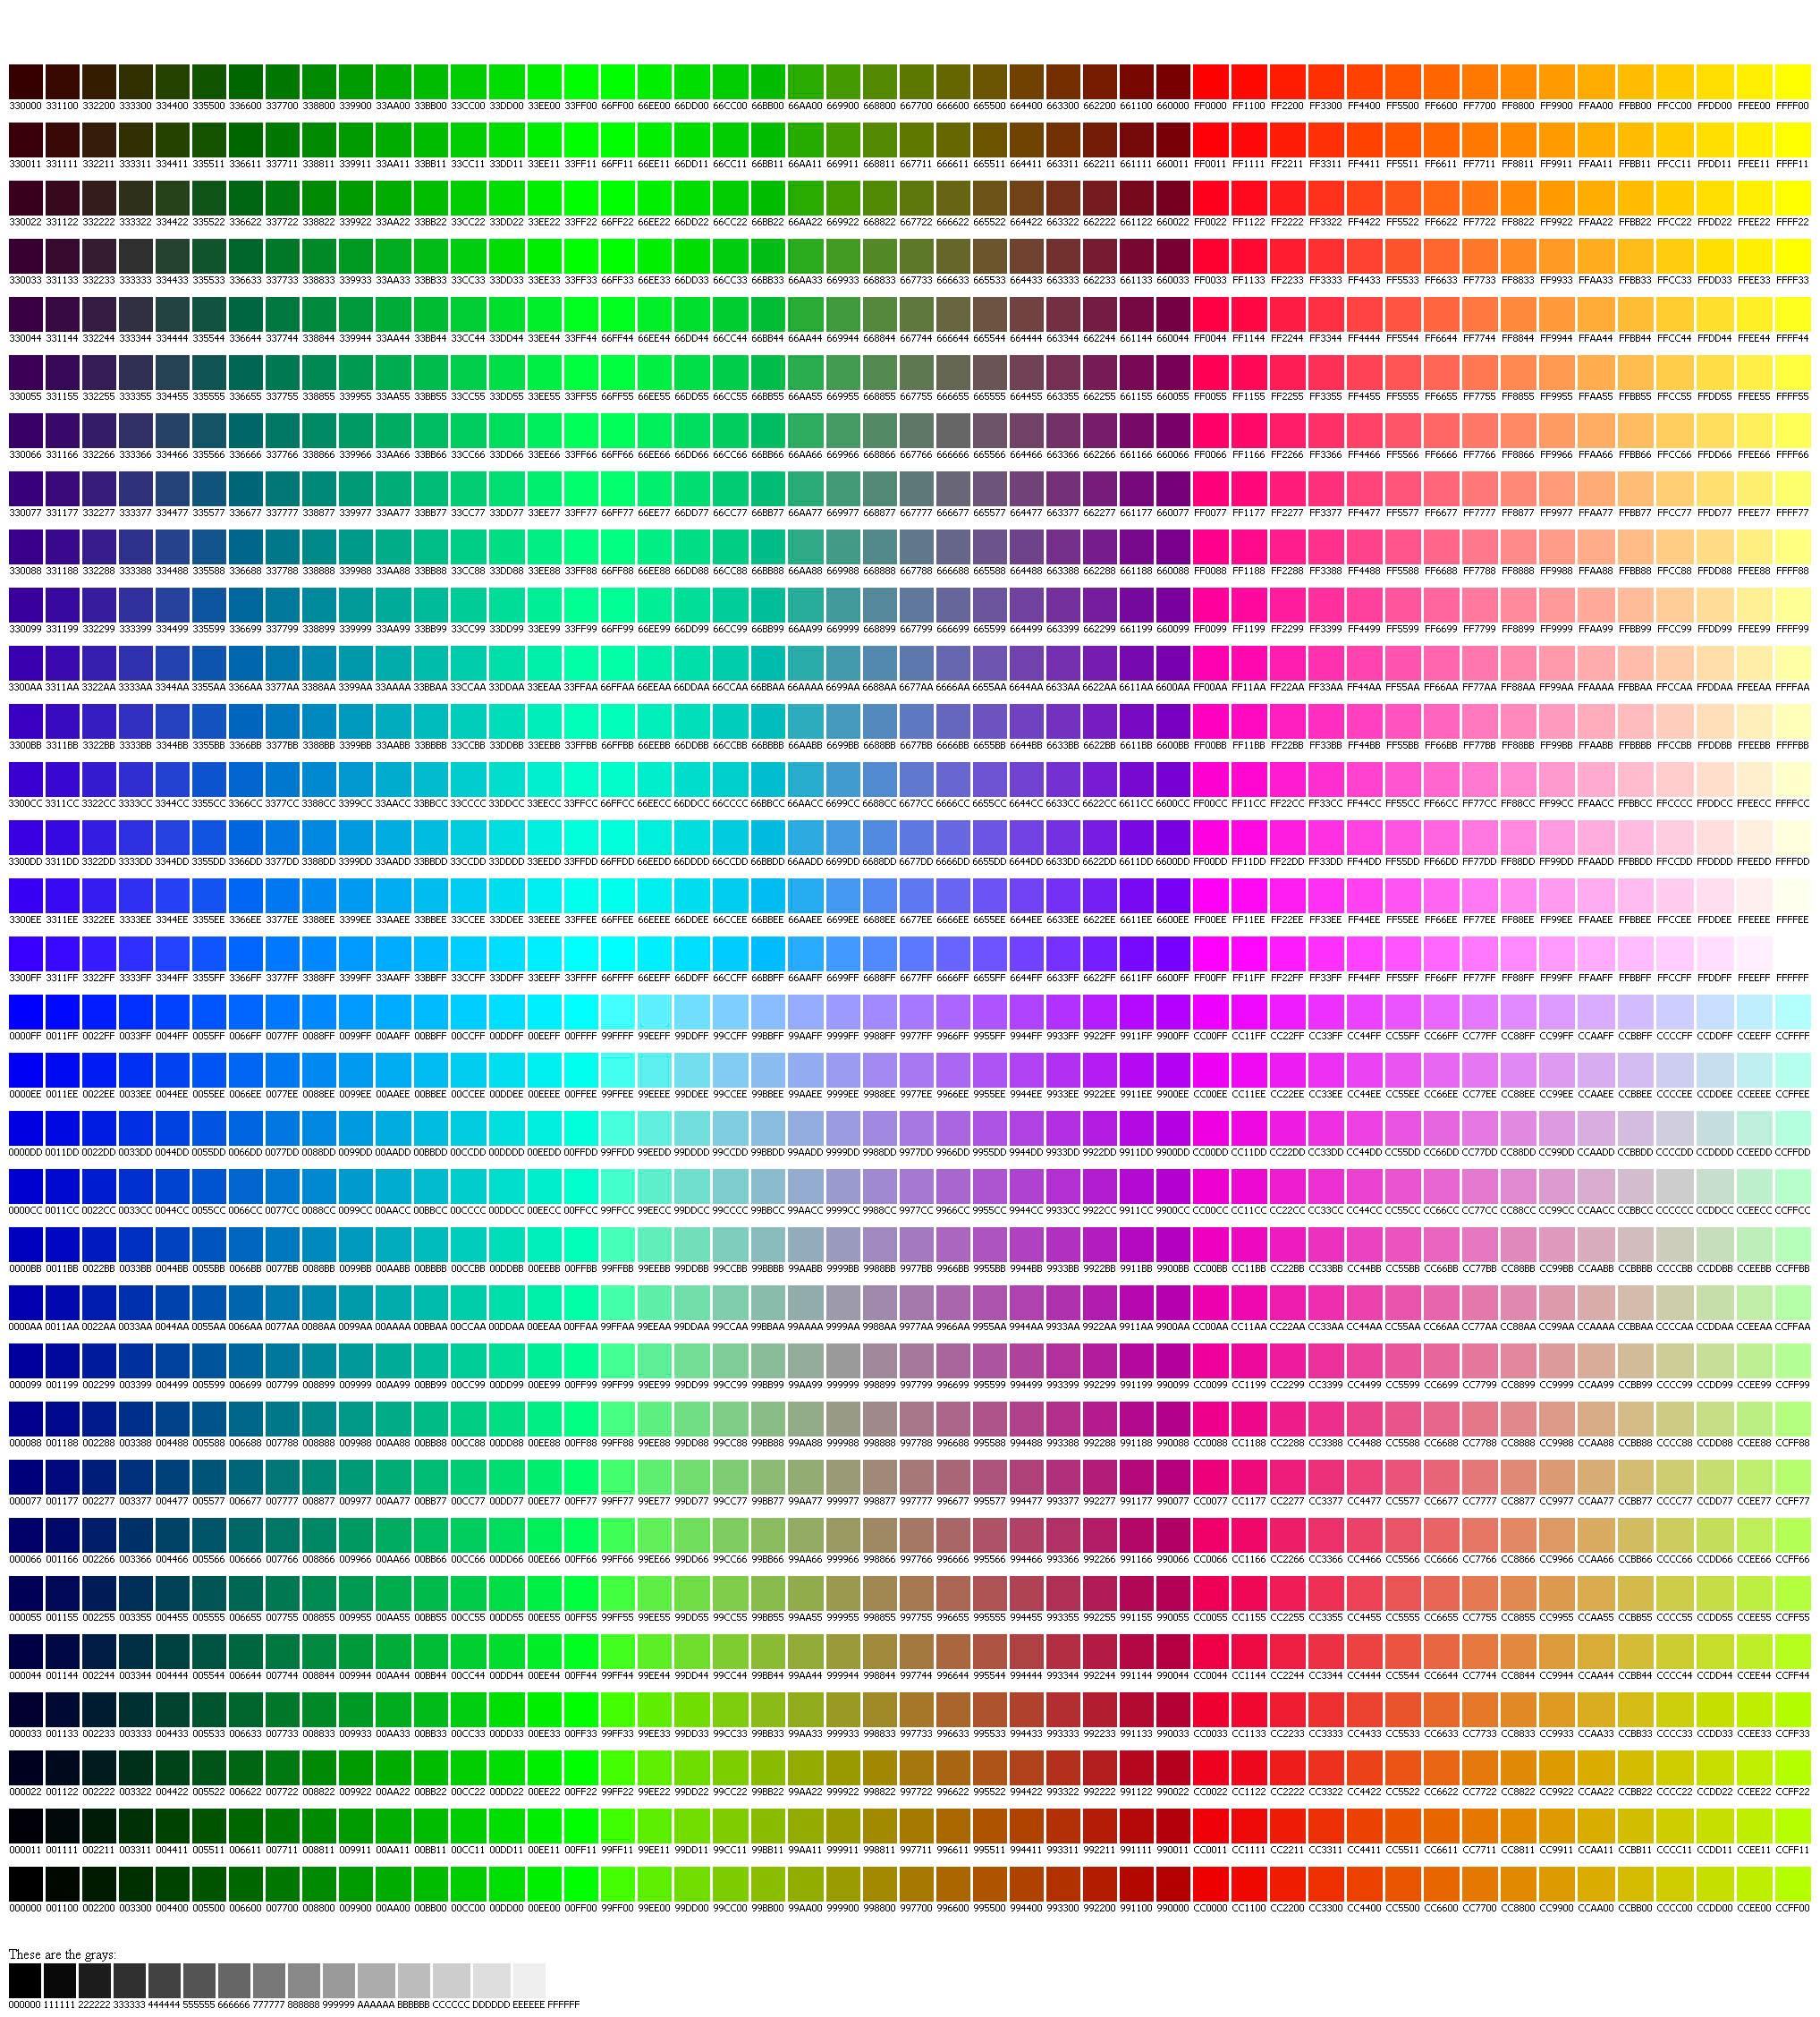 Detailed Pantone Color Communication Chart